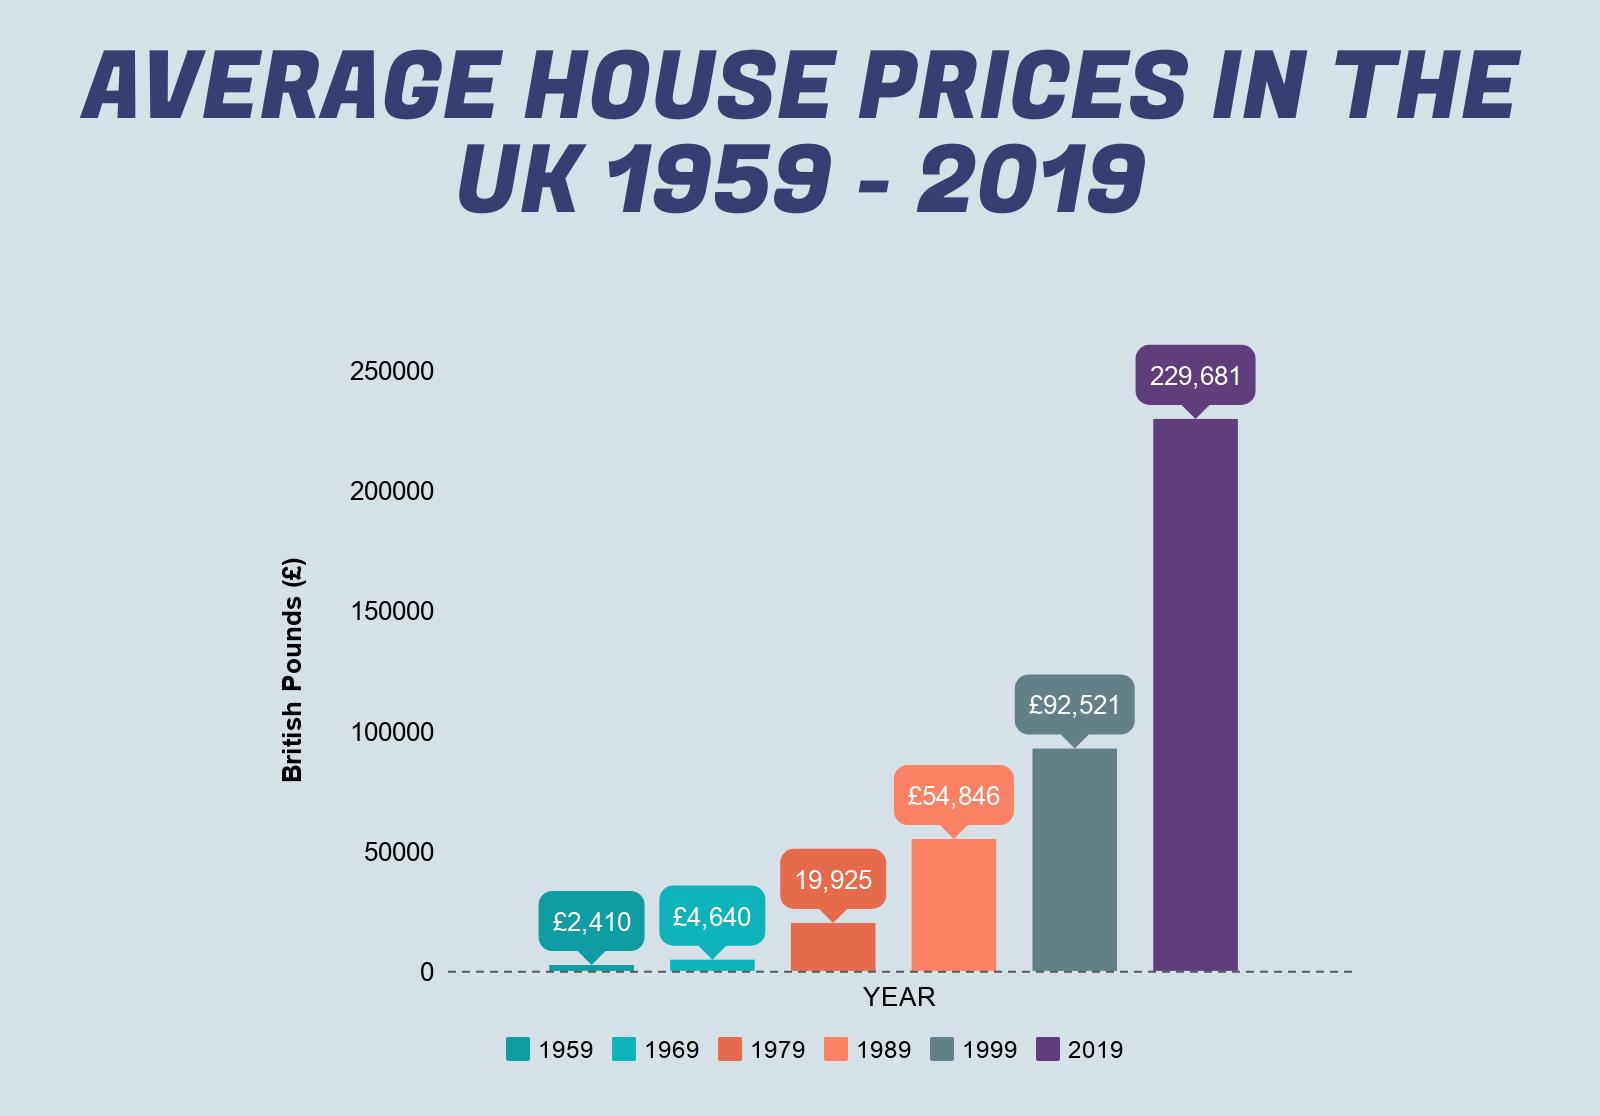 Average house prices UK 1959-2019 barchart